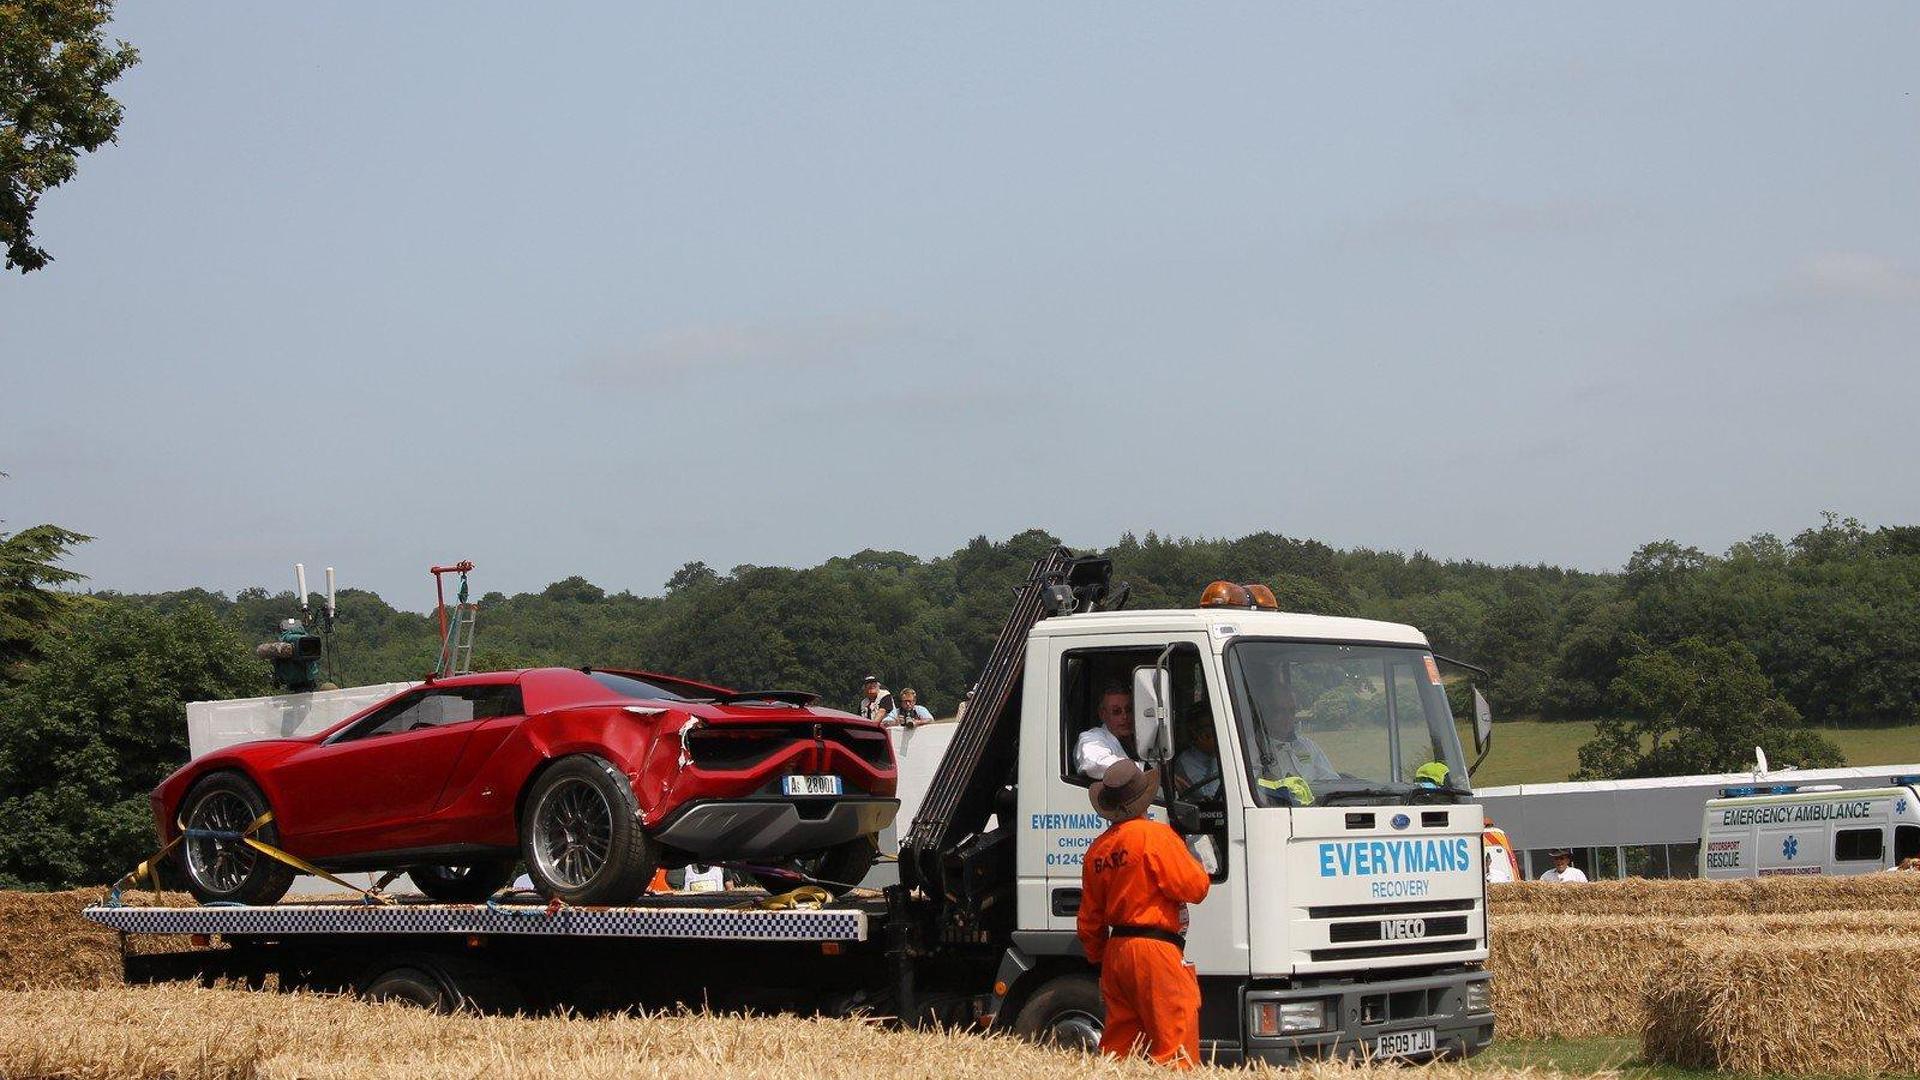 Italdesign Giugiaro Parcour Concept crashes at Goodwood [VIDEO ADDED]